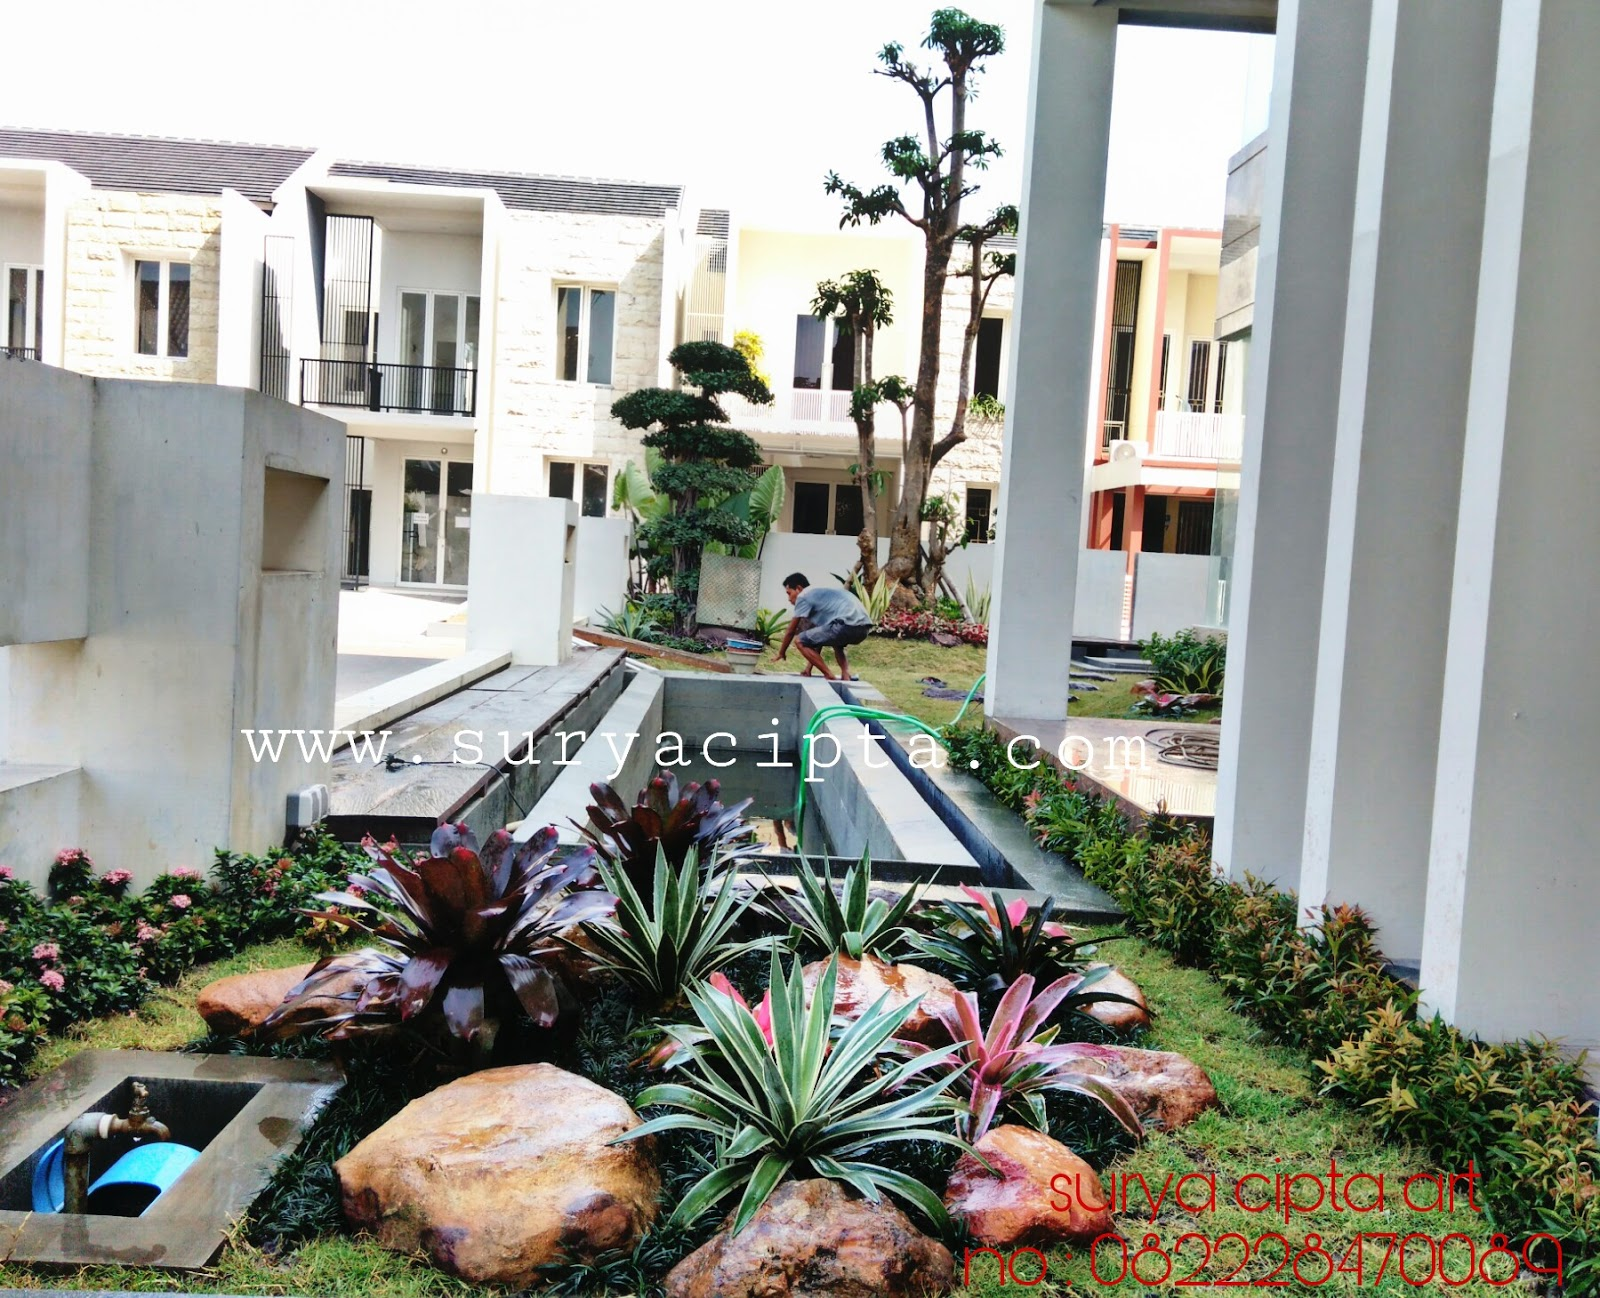 Suryacipta Surya Cipta Art Tukang Taman Profesional Surabaya